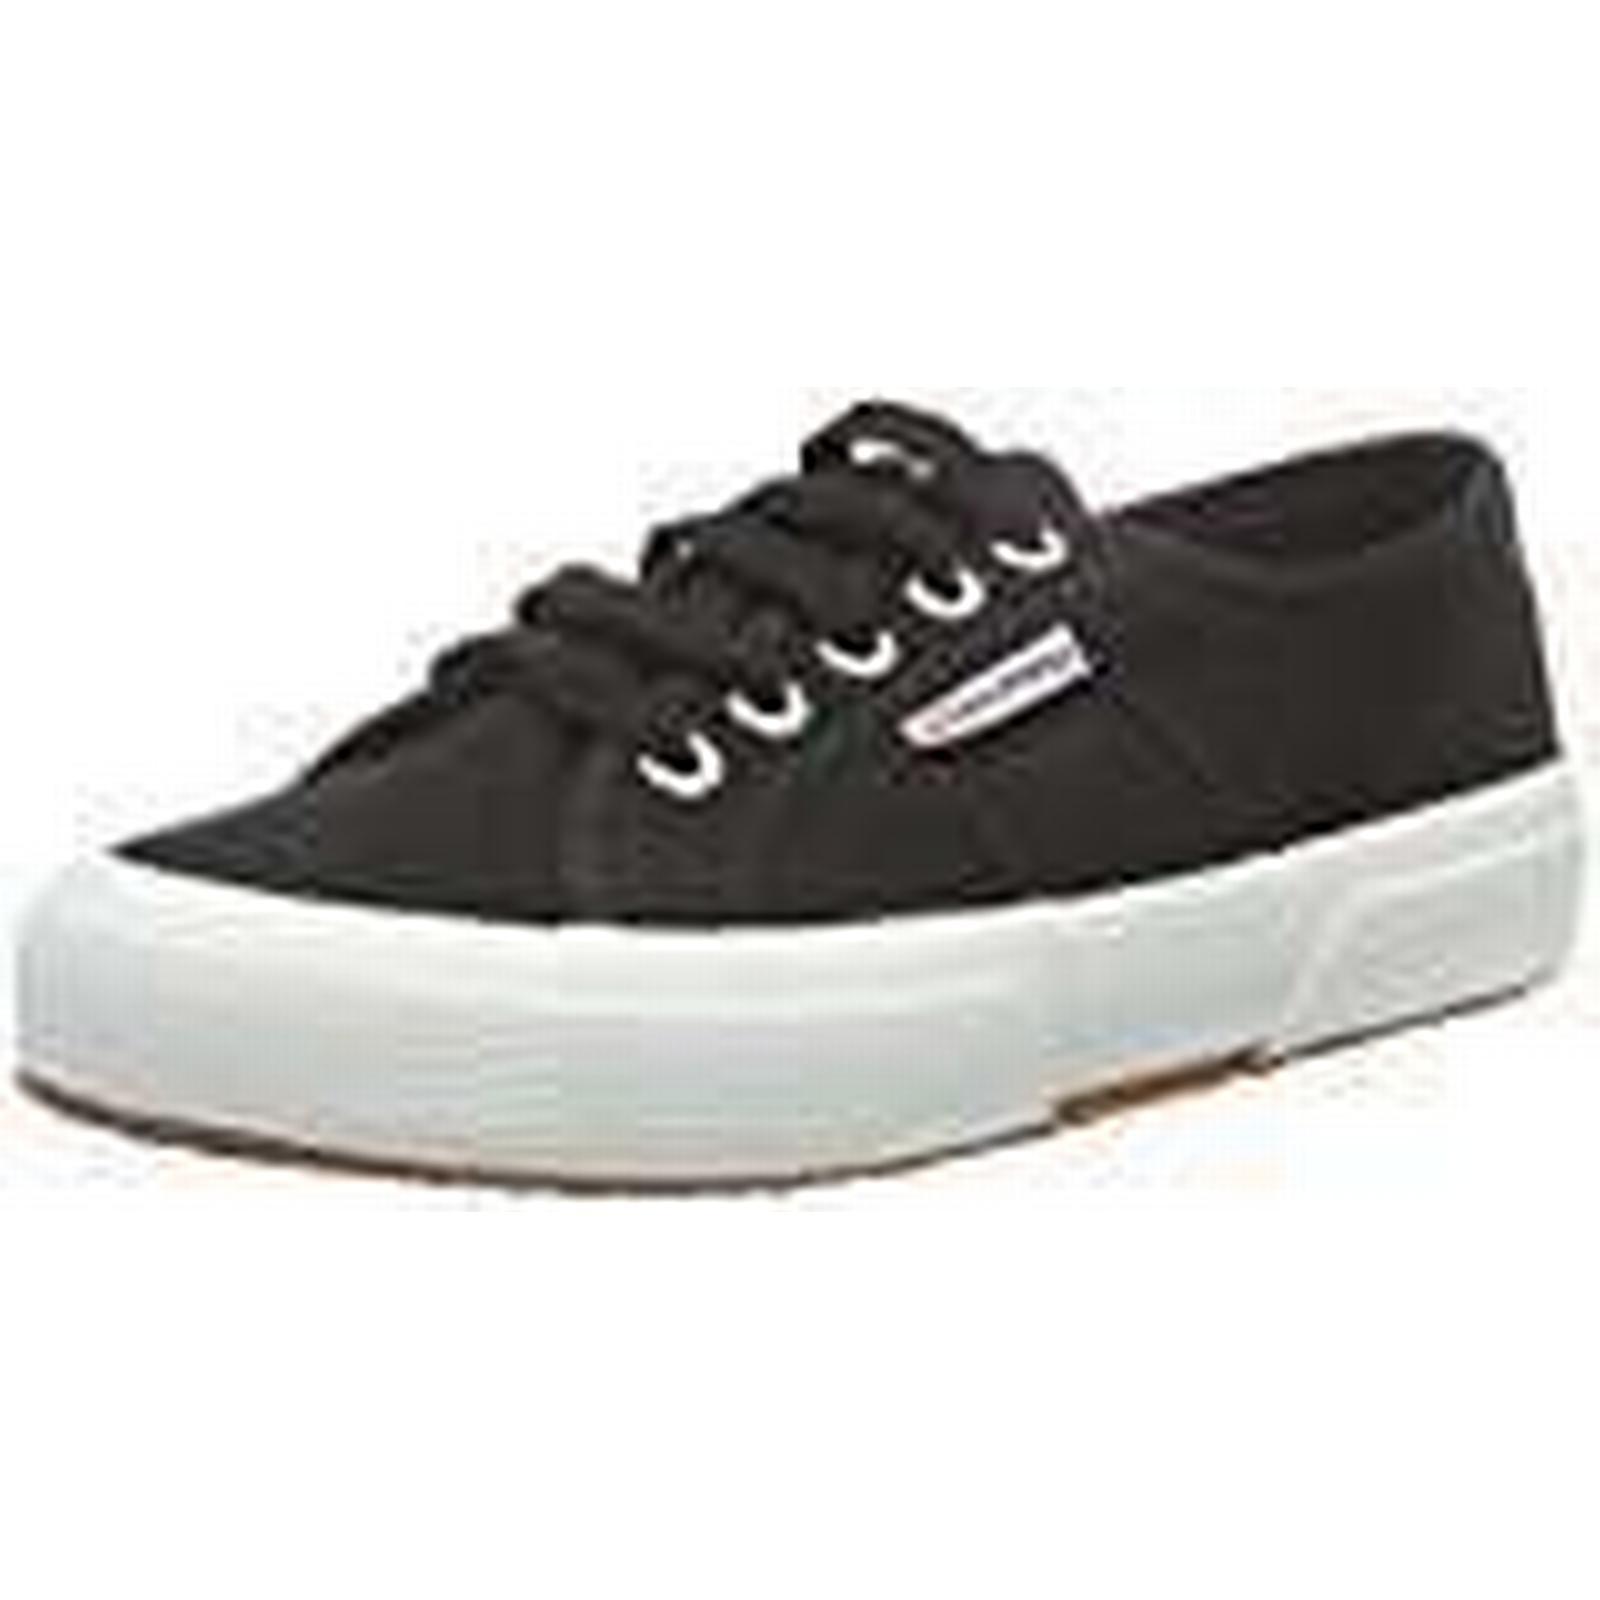 Superga 2750 5 Cotu Classic, Unisex Adults' Low-Top Sneakers, Black, 5 2750 UK (38 EU) 72dce2